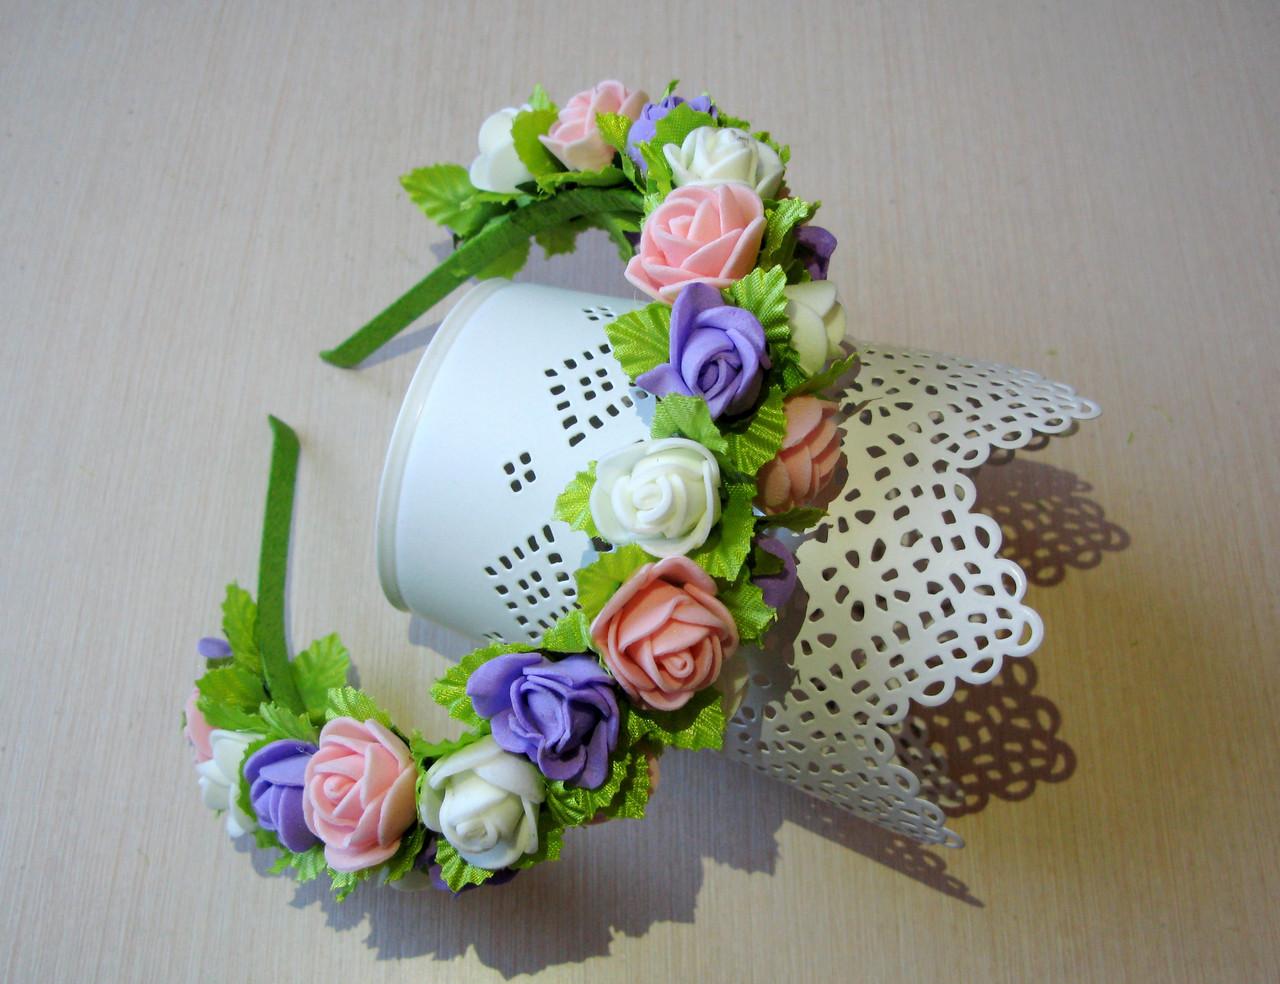 Обруч в пастельних тонах з трояндочками з латексу і атласними листочками 125 грн